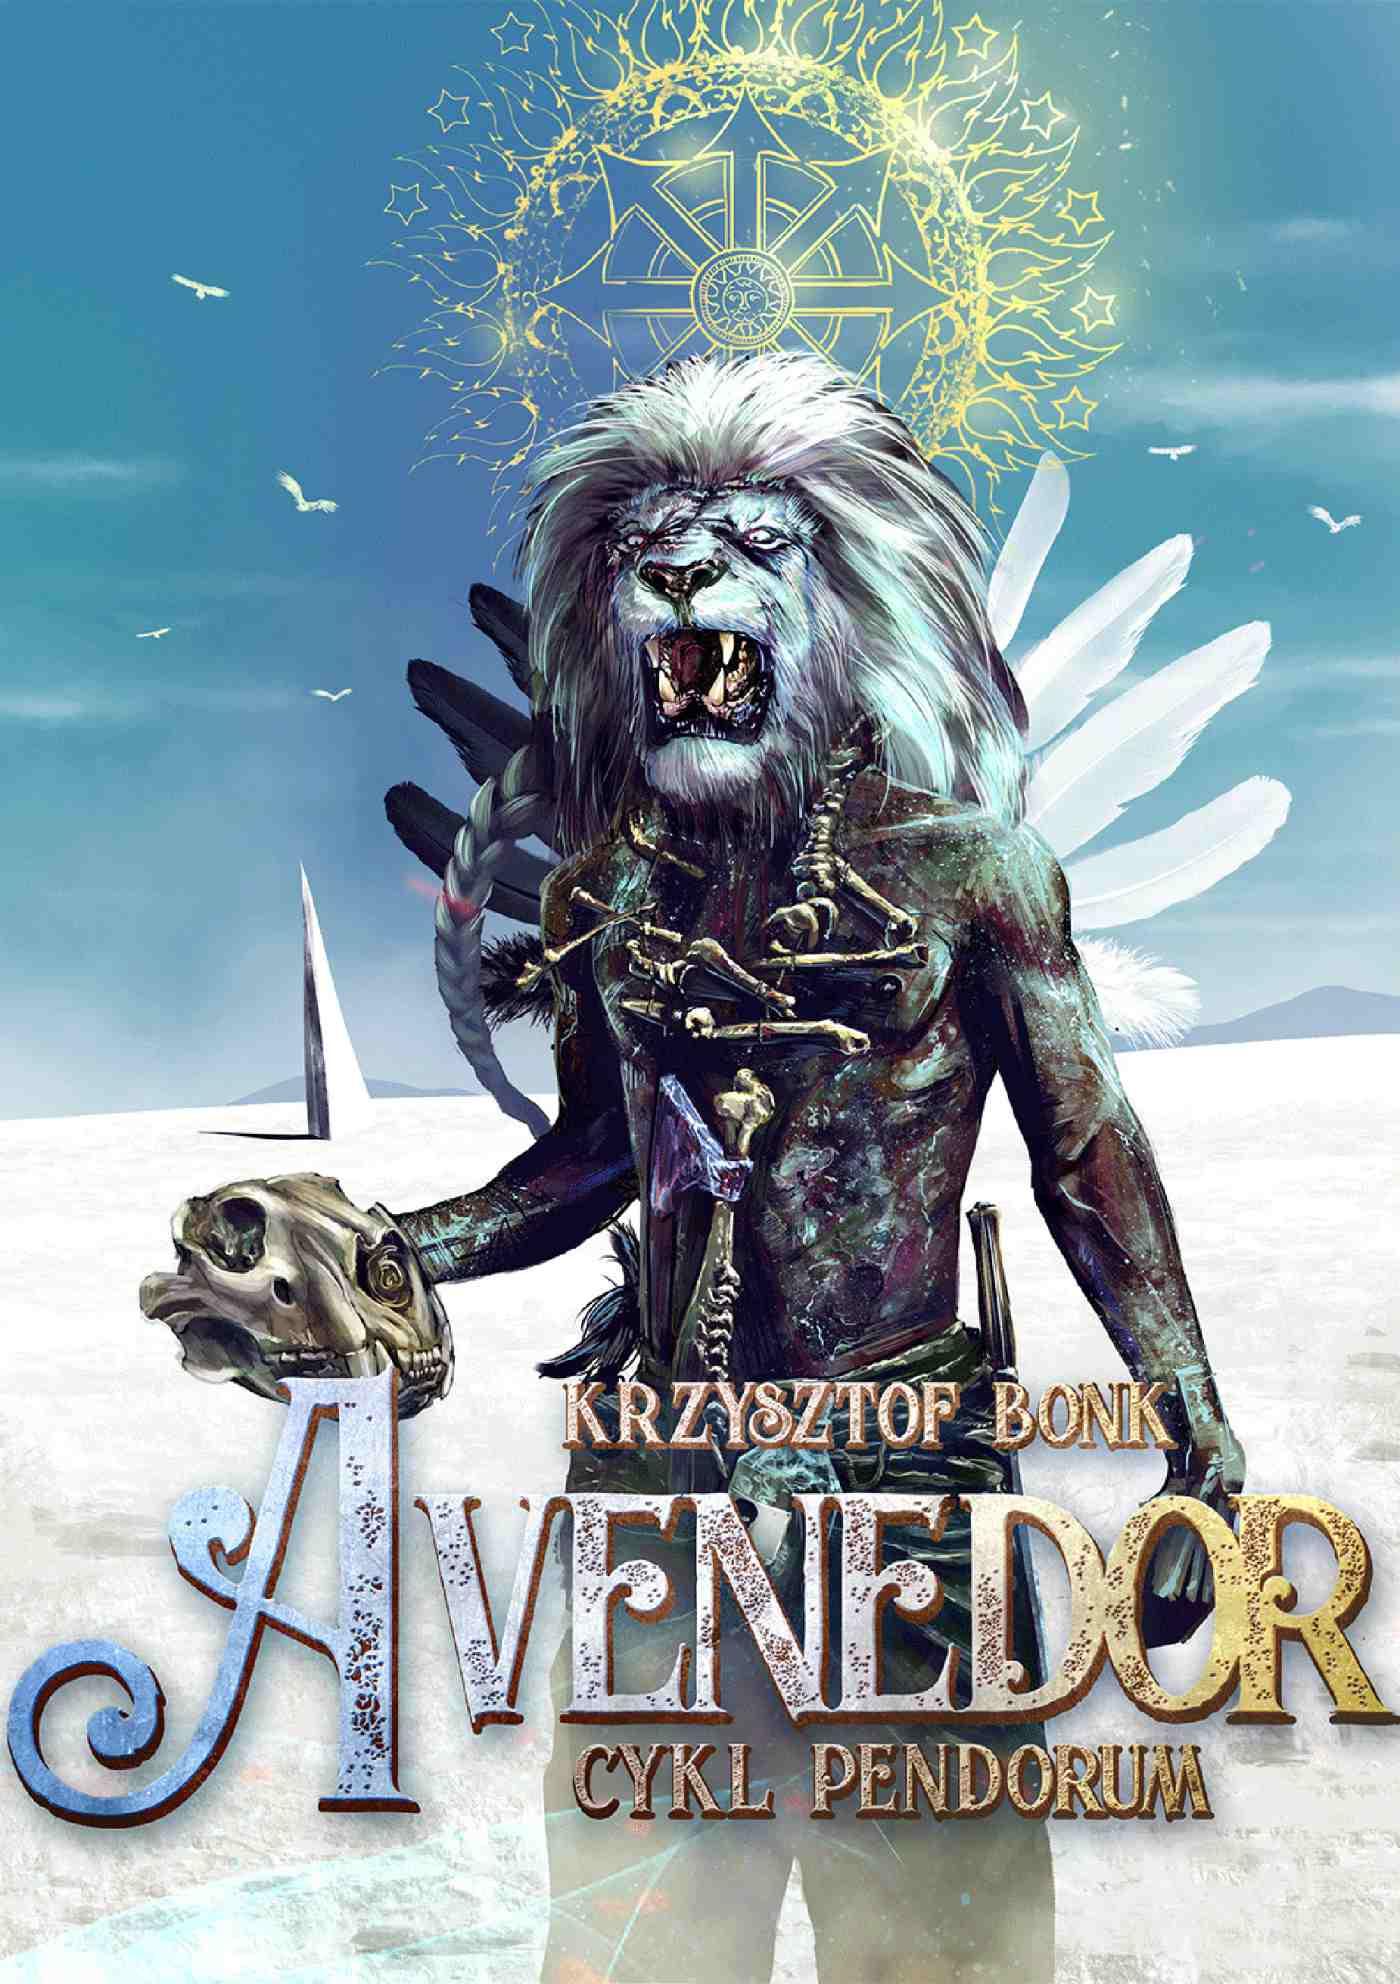 Avenedor. Cykl Pendorum. Część VII